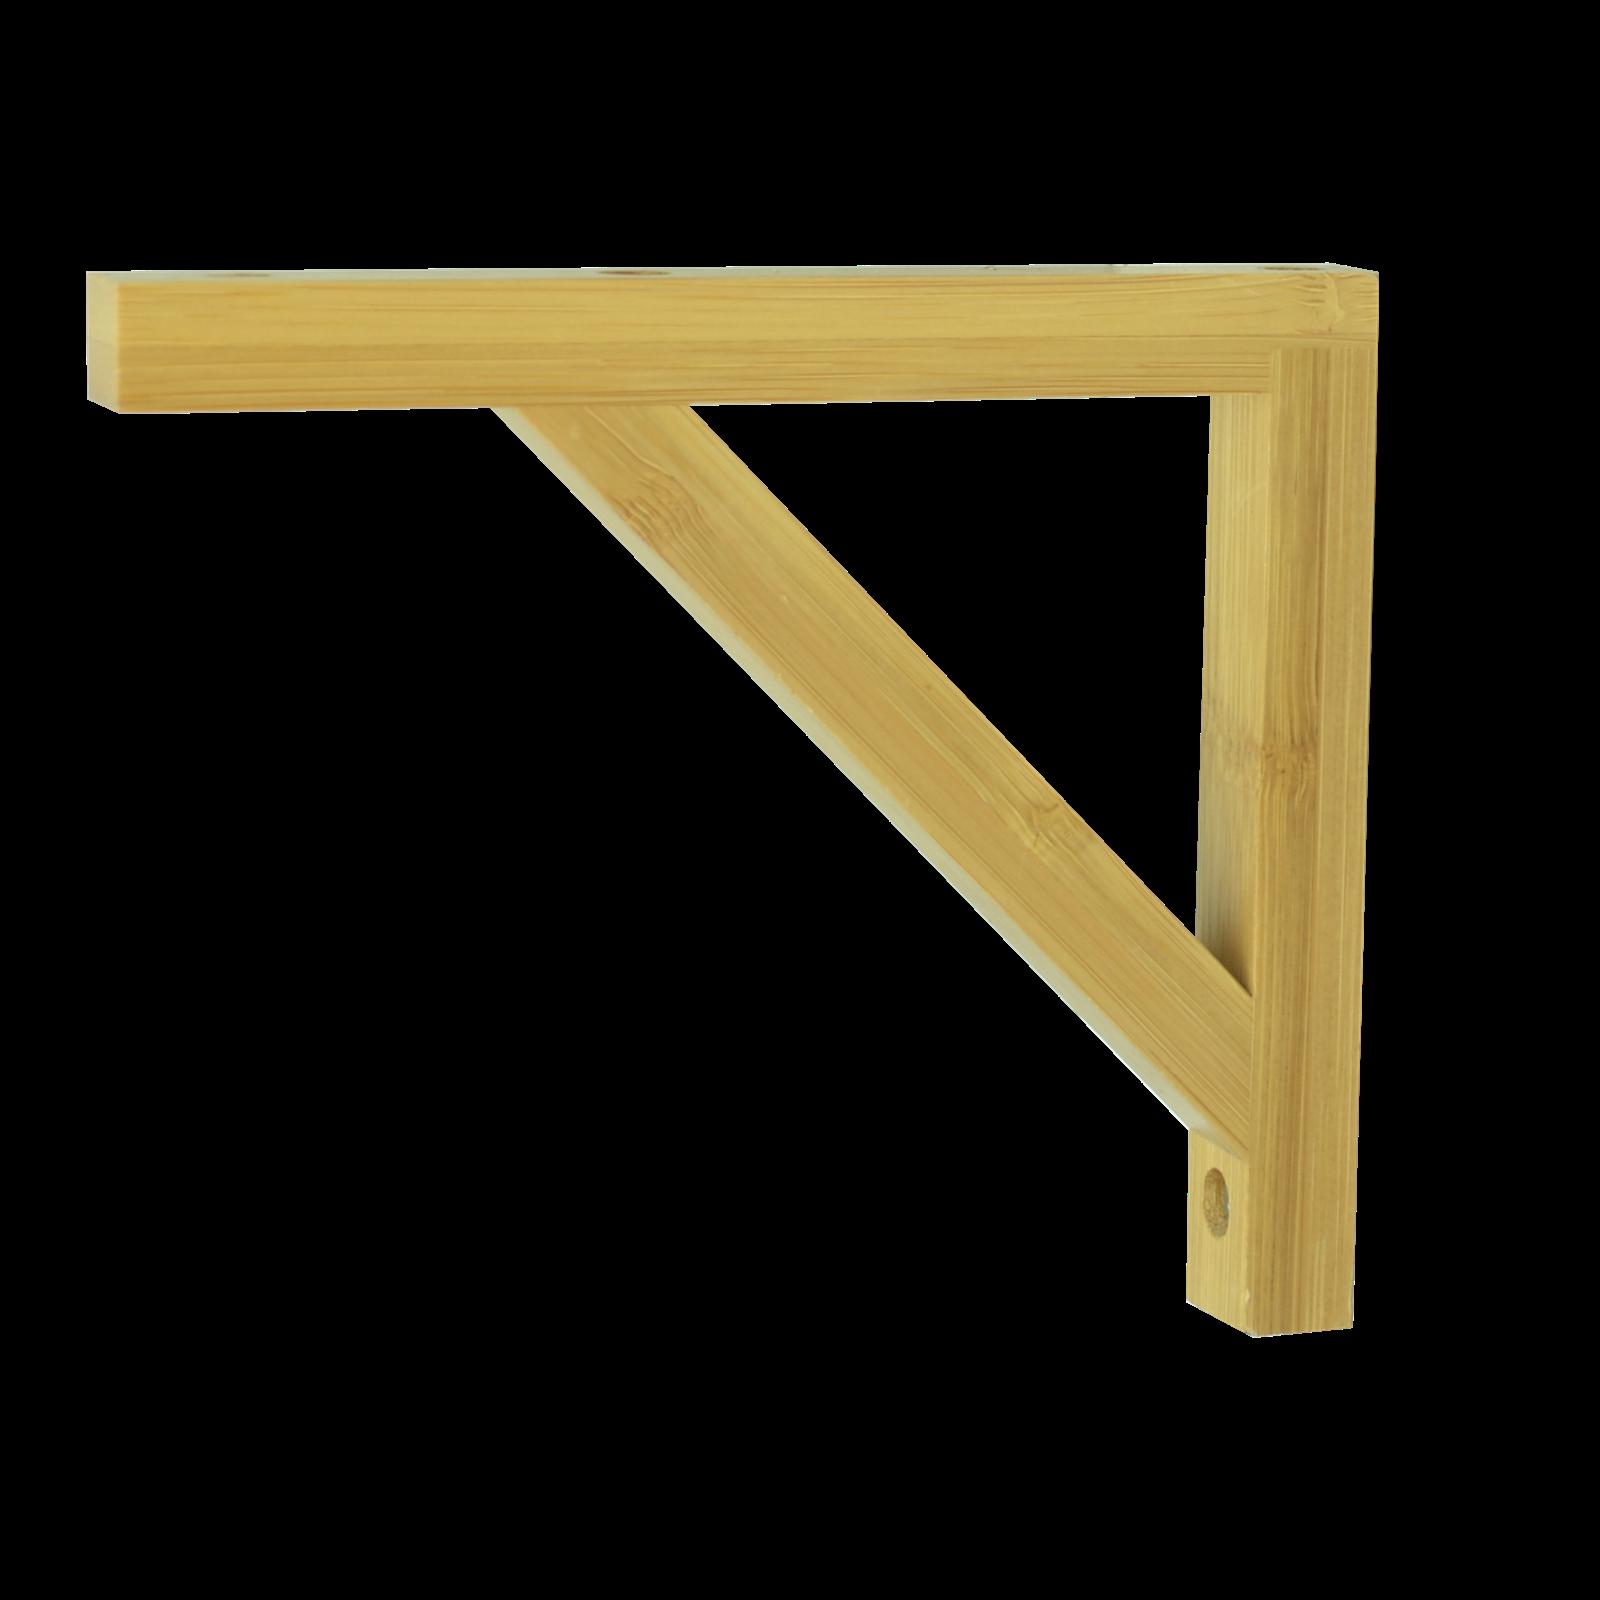 Carinya 130 x 150 x 20 x 15mm Varnished Bamboo Angle Bracket